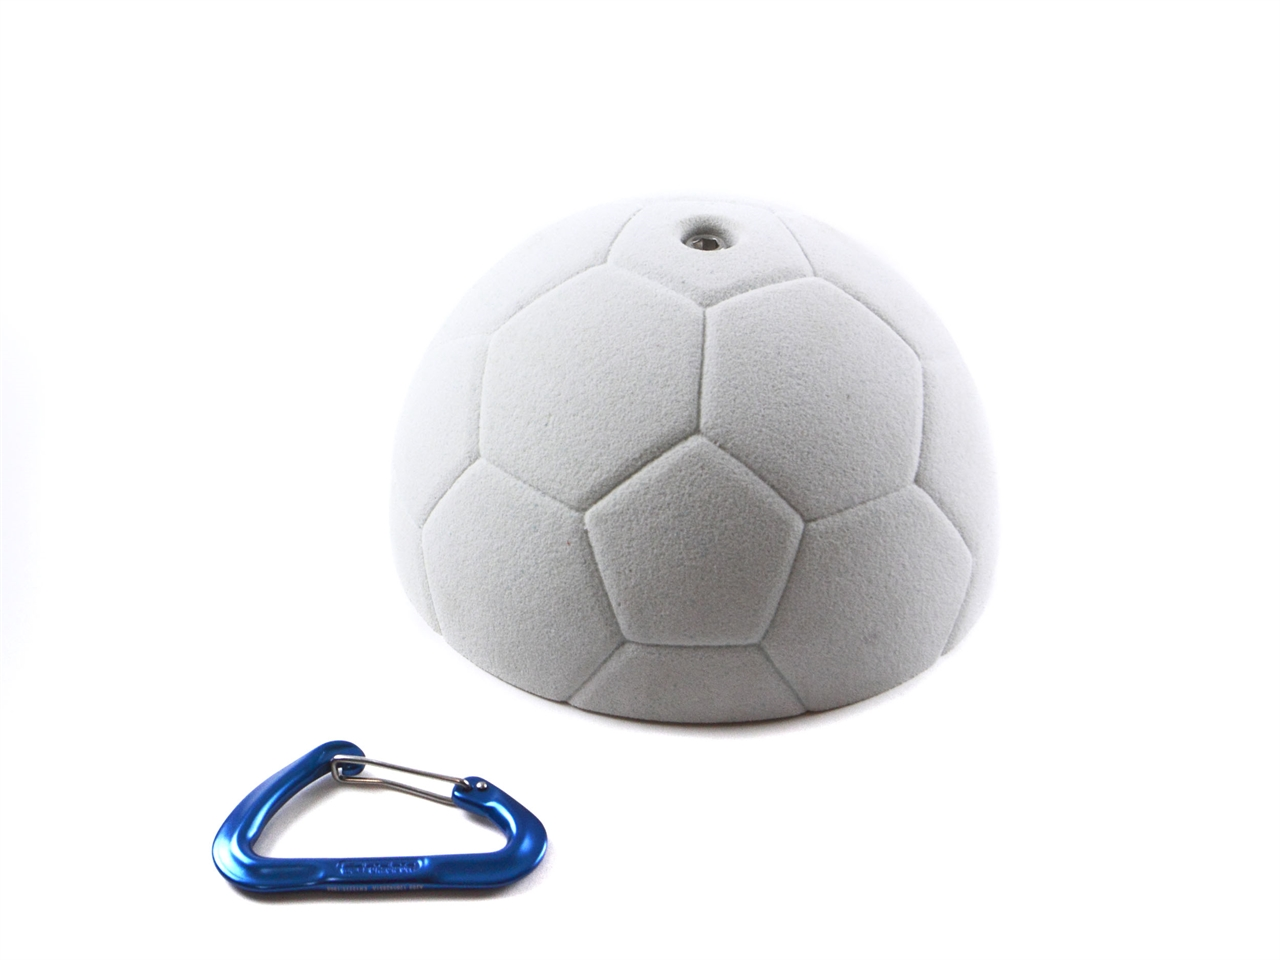 Xxl Live Soccer